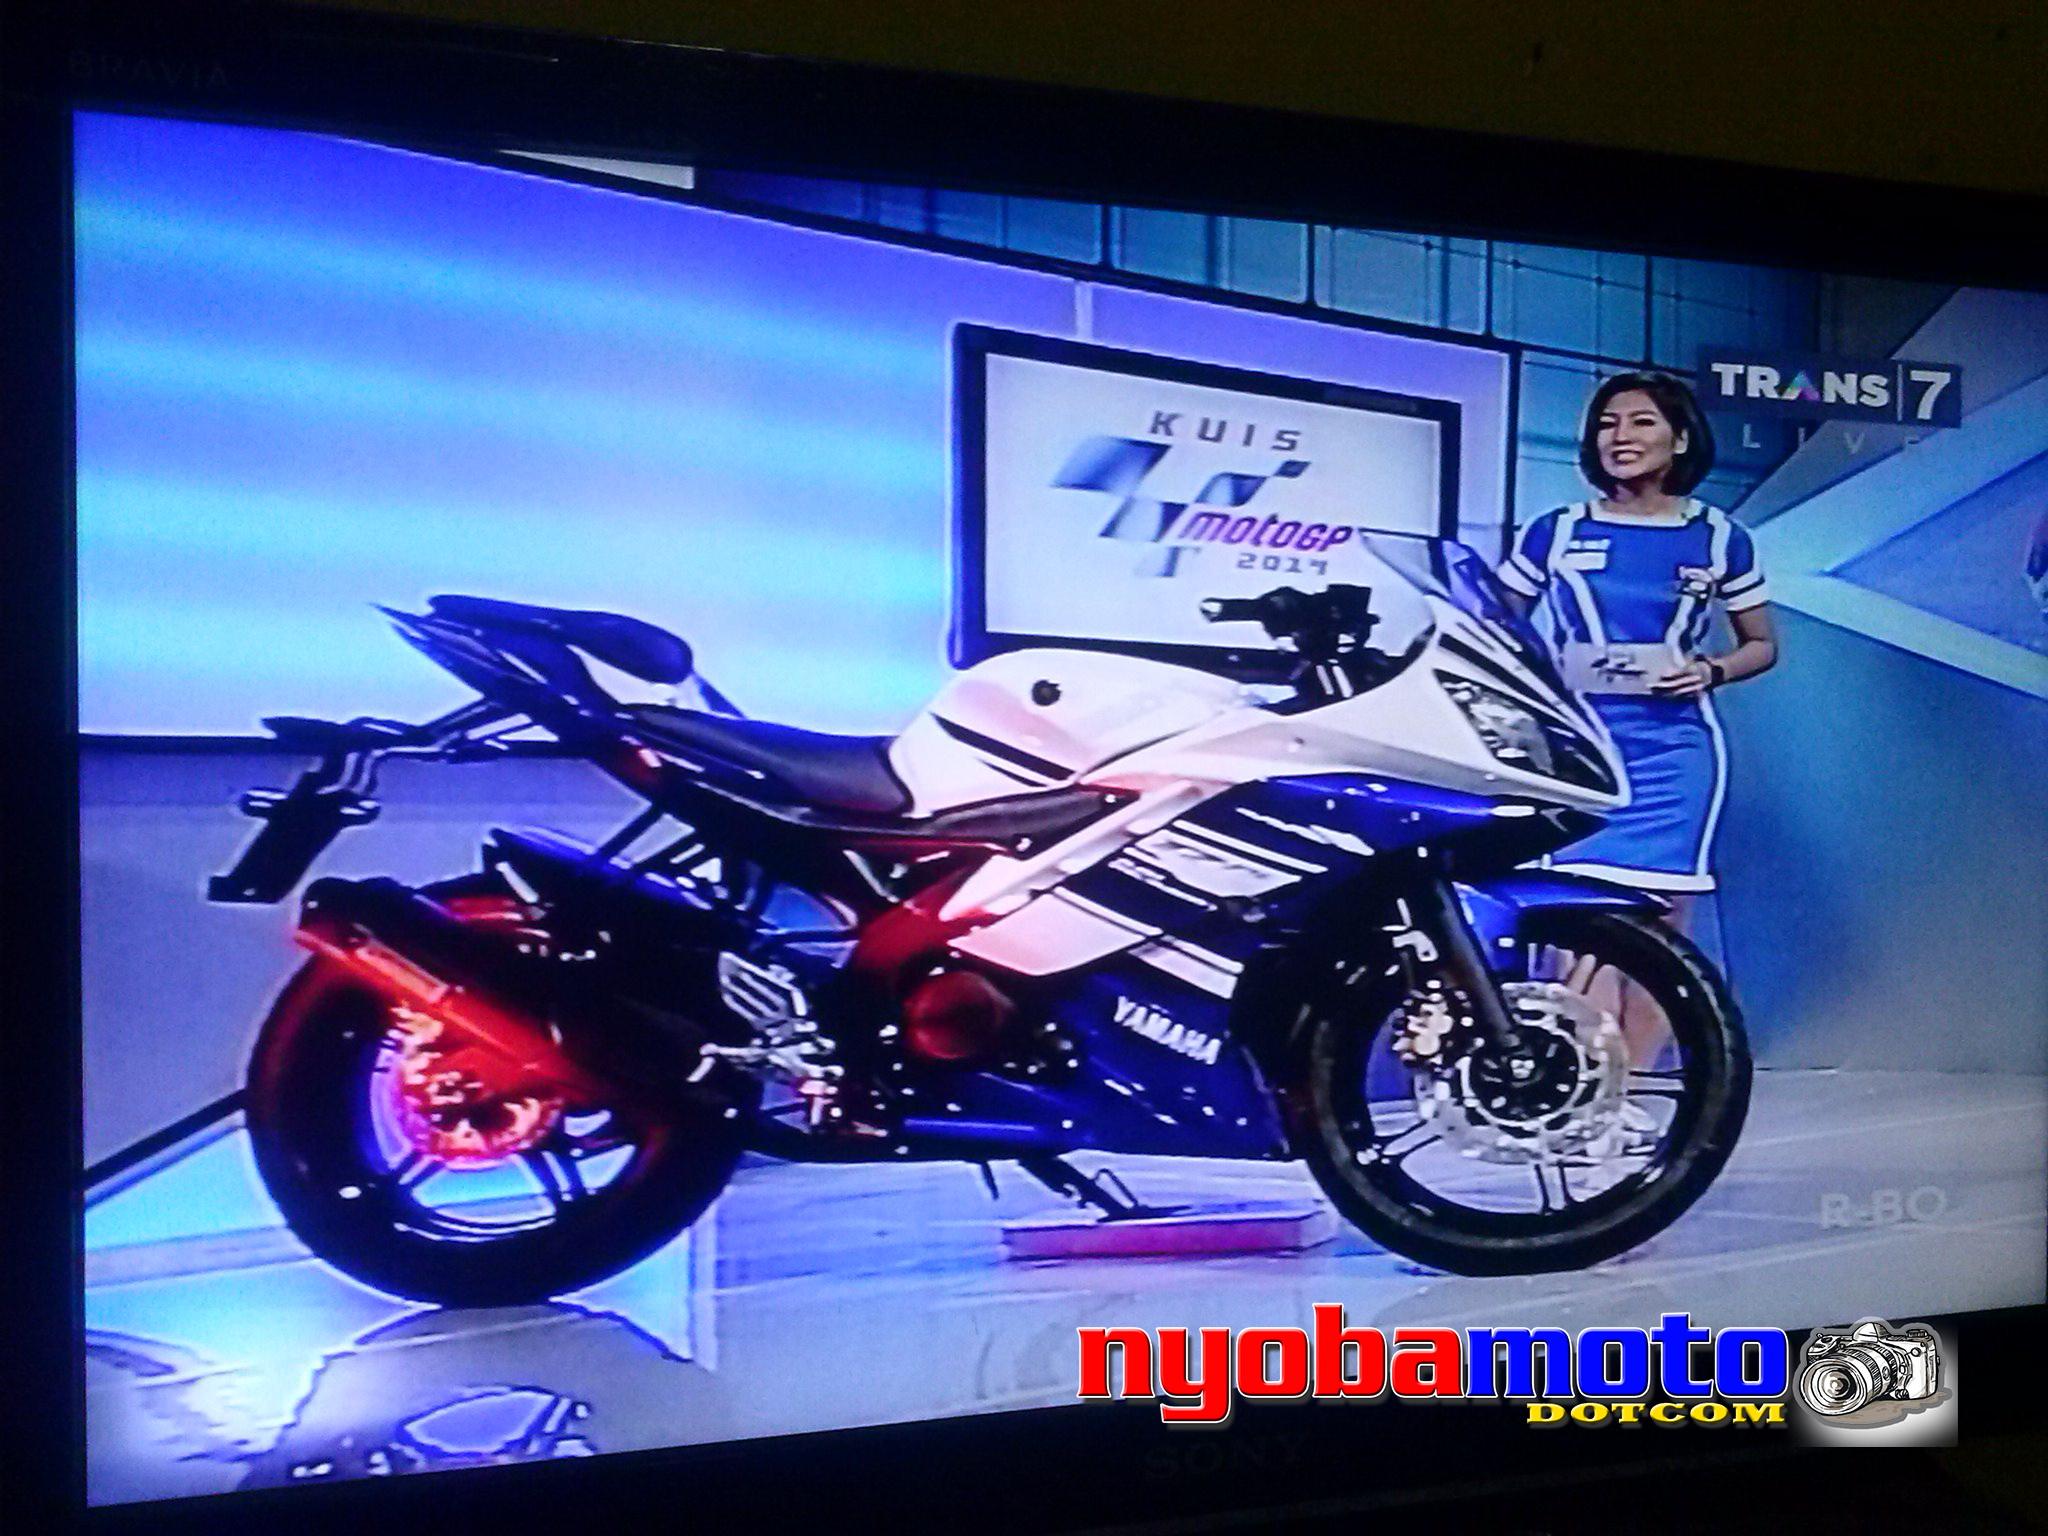 Motogp Qatar 24 Maret 2014 | MotoGP 2017 Info, Video, Points Table